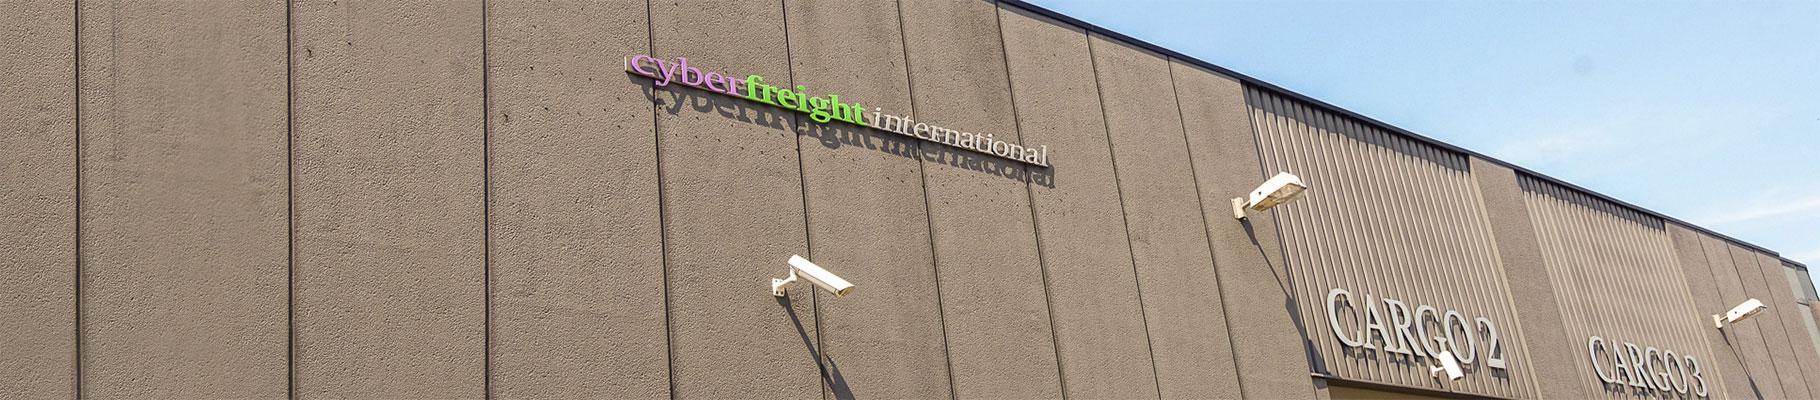 news - cyberfreight international